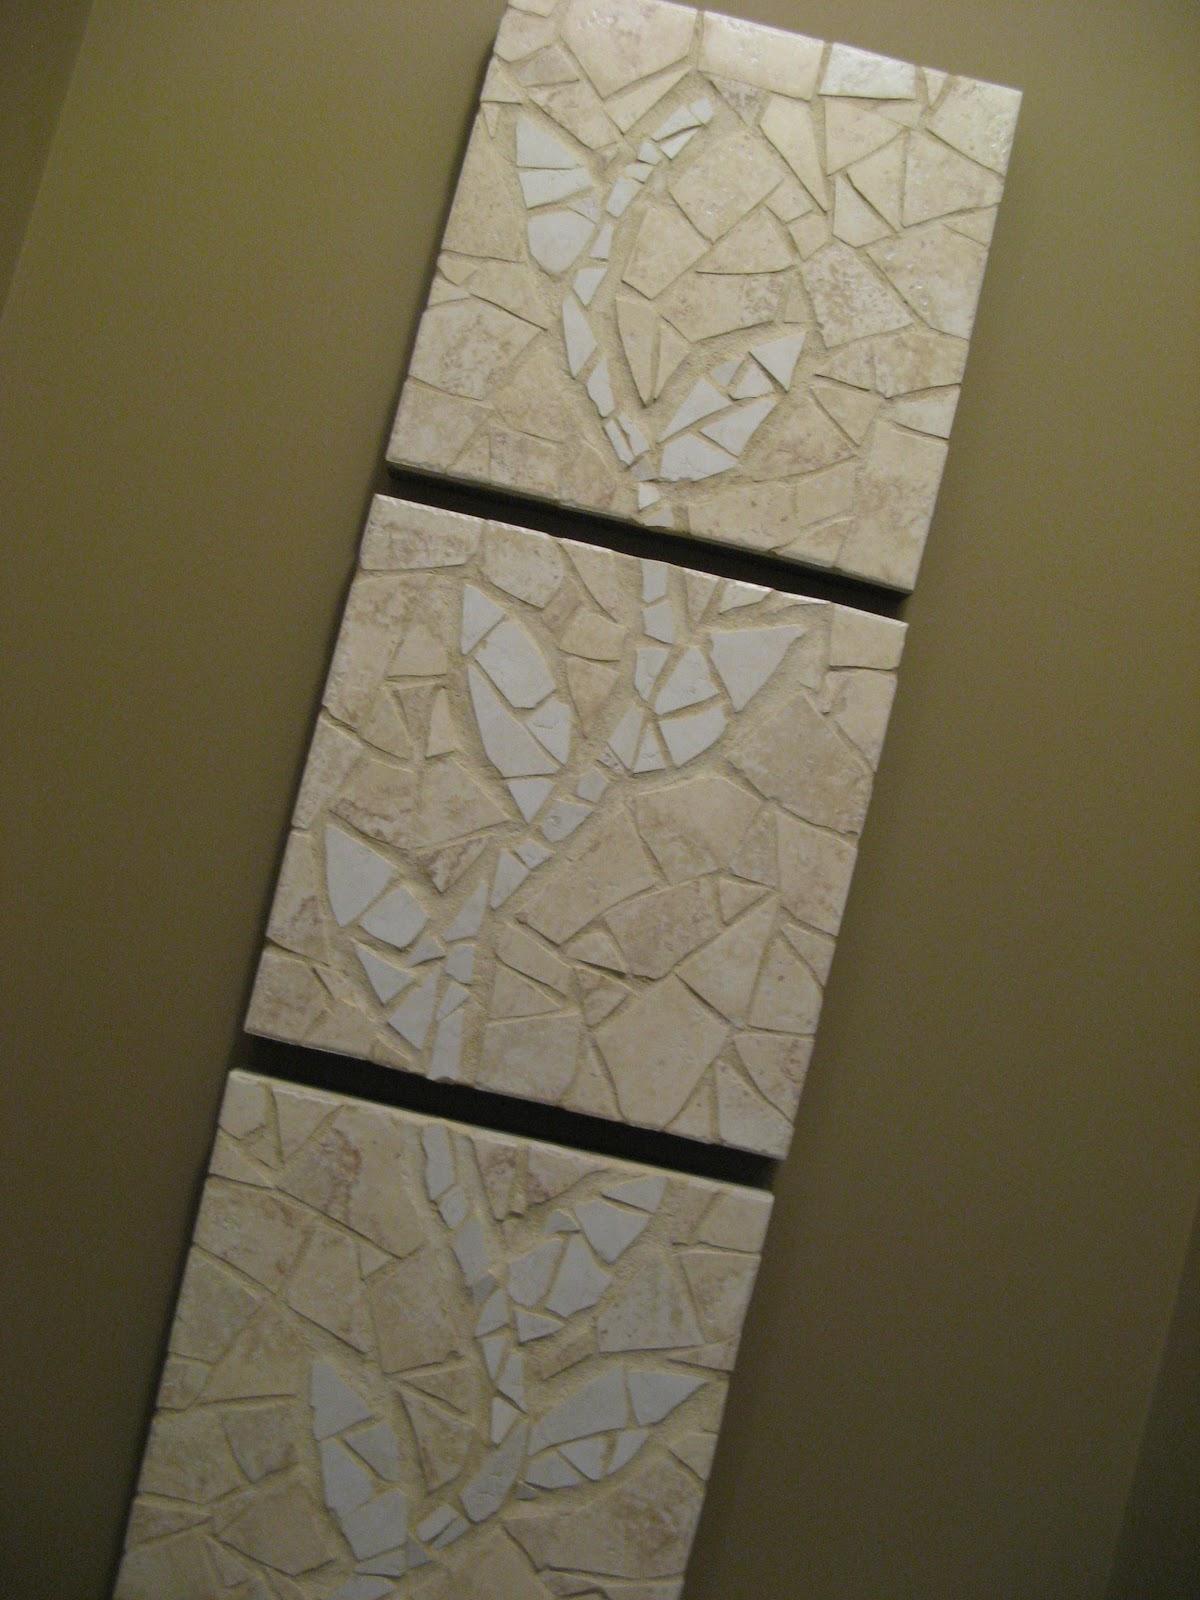 Susan snyder mosaic wall art panels mosaic broken tile wall art dailygadgetfo Gallery